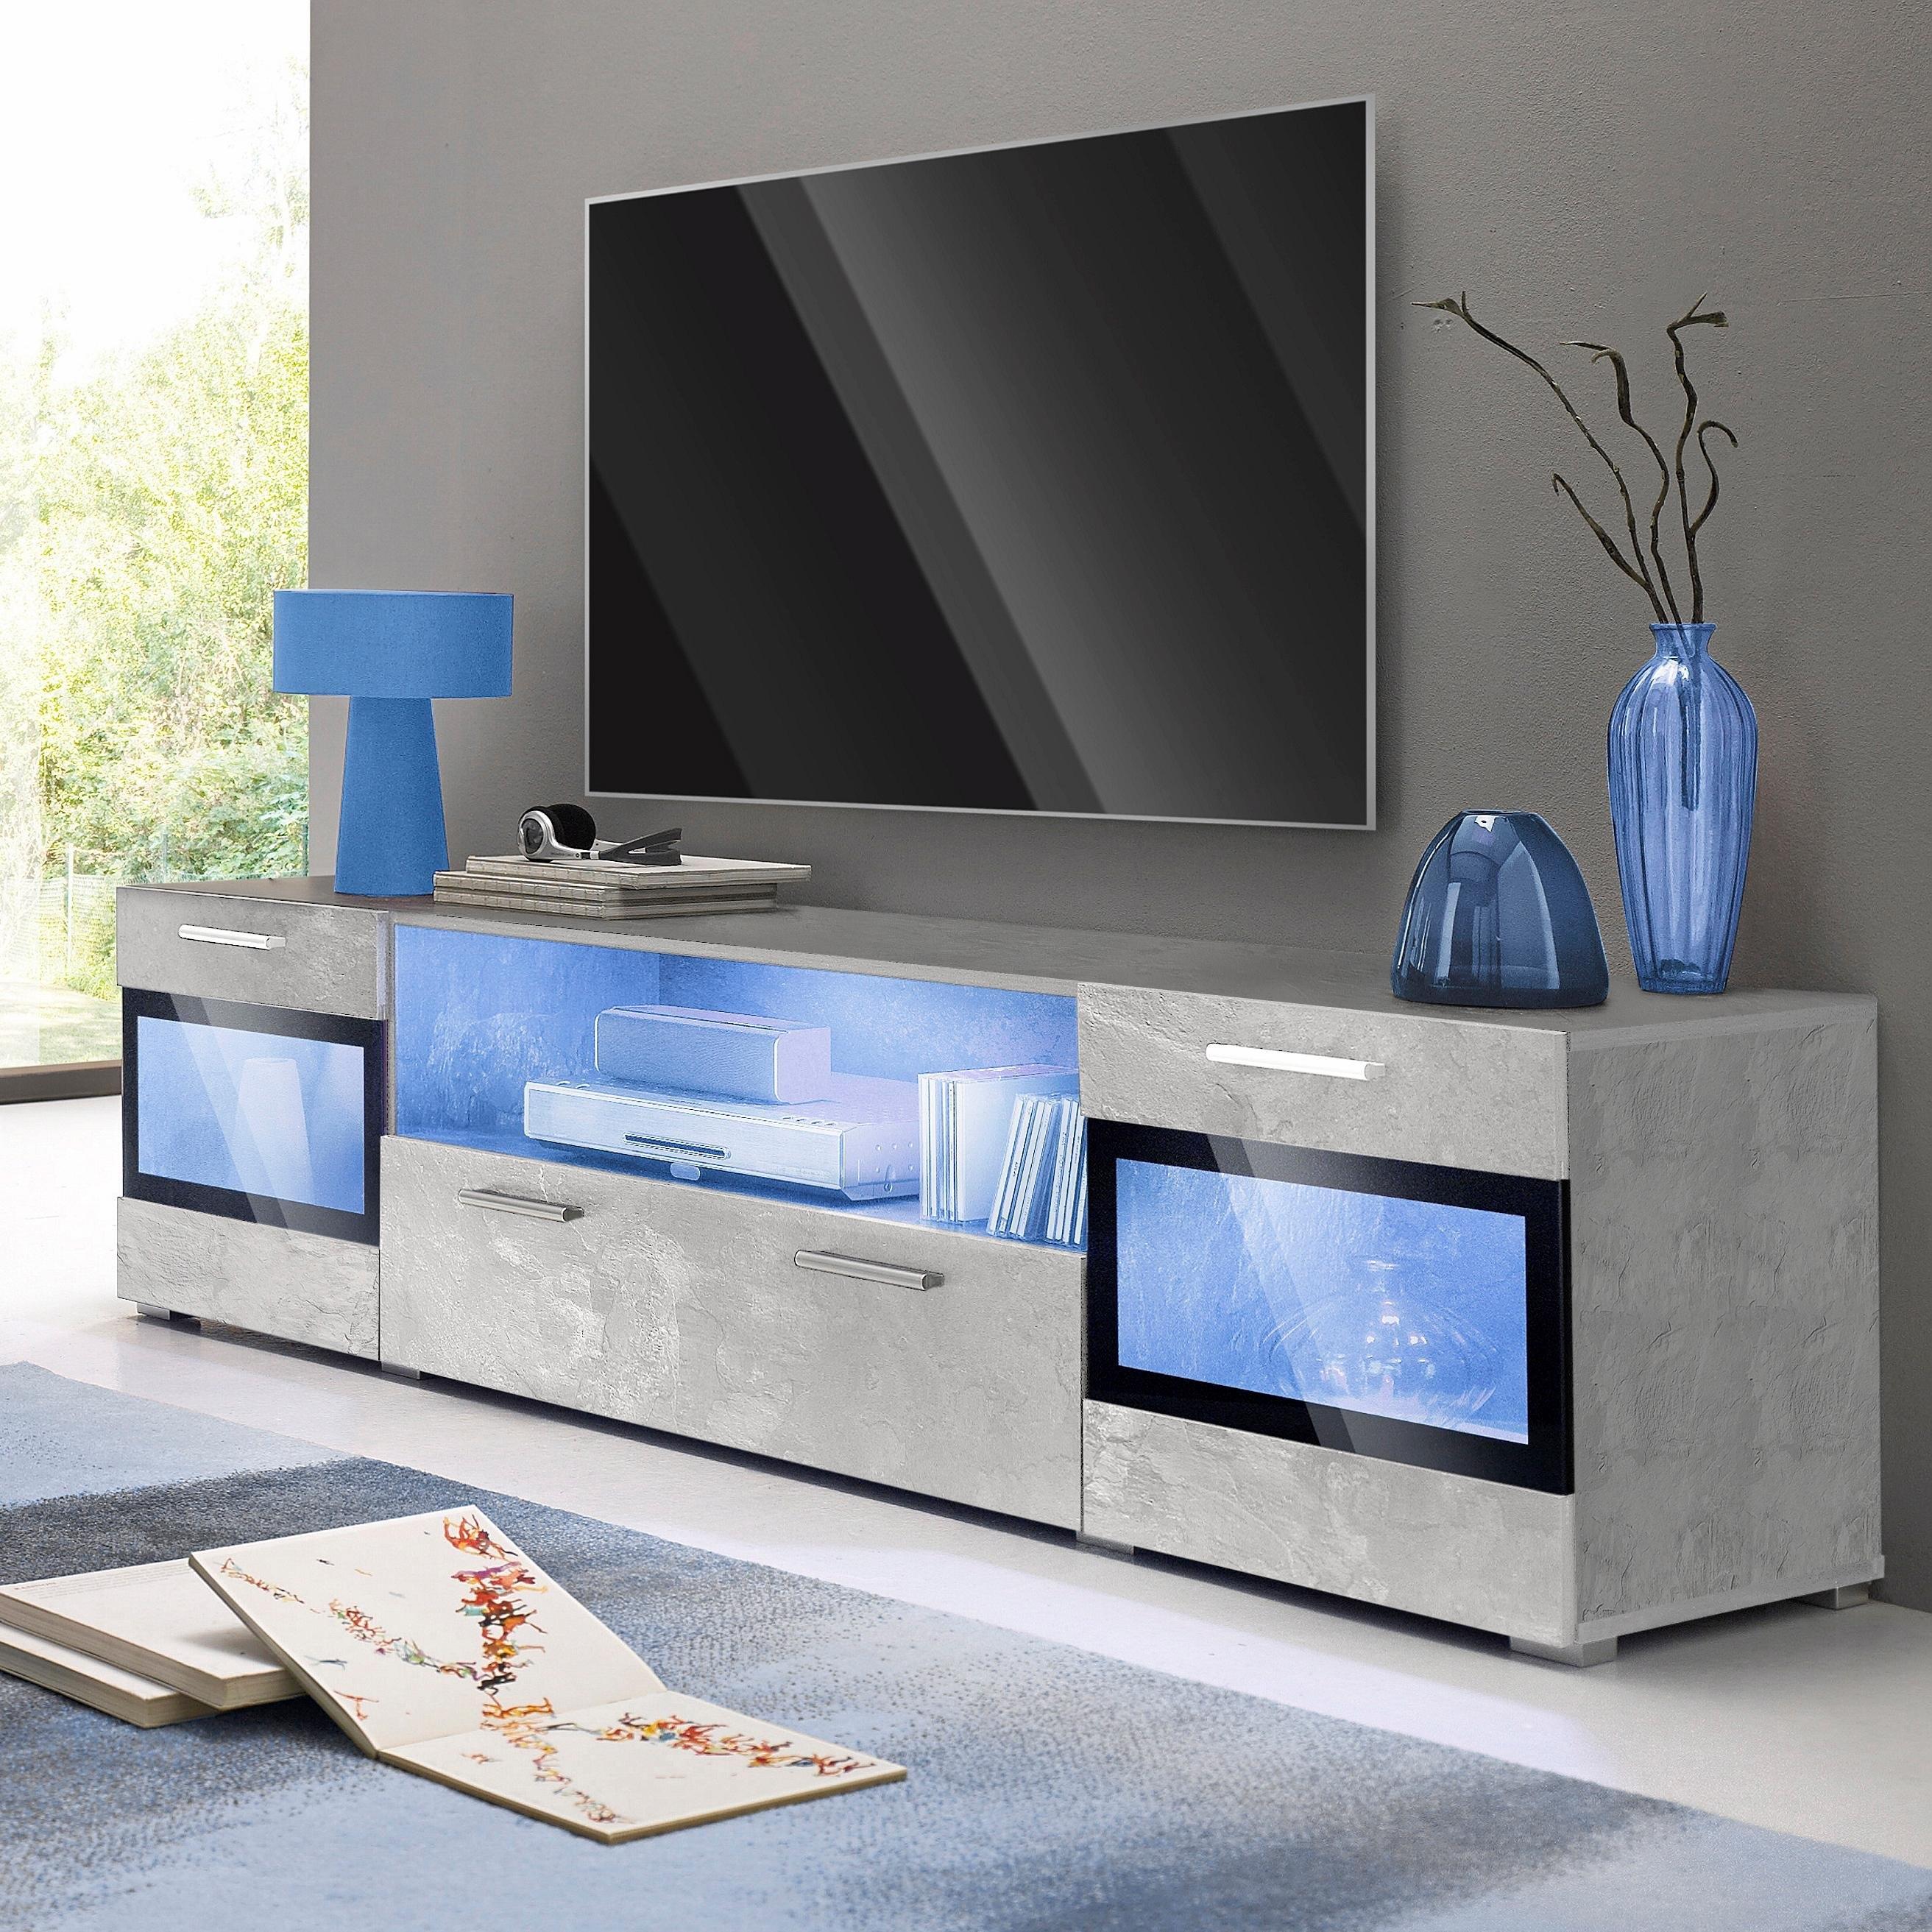 TRENDMANUFAKTUR tv-meubel »Sarahmix« online kopen op otto.nl